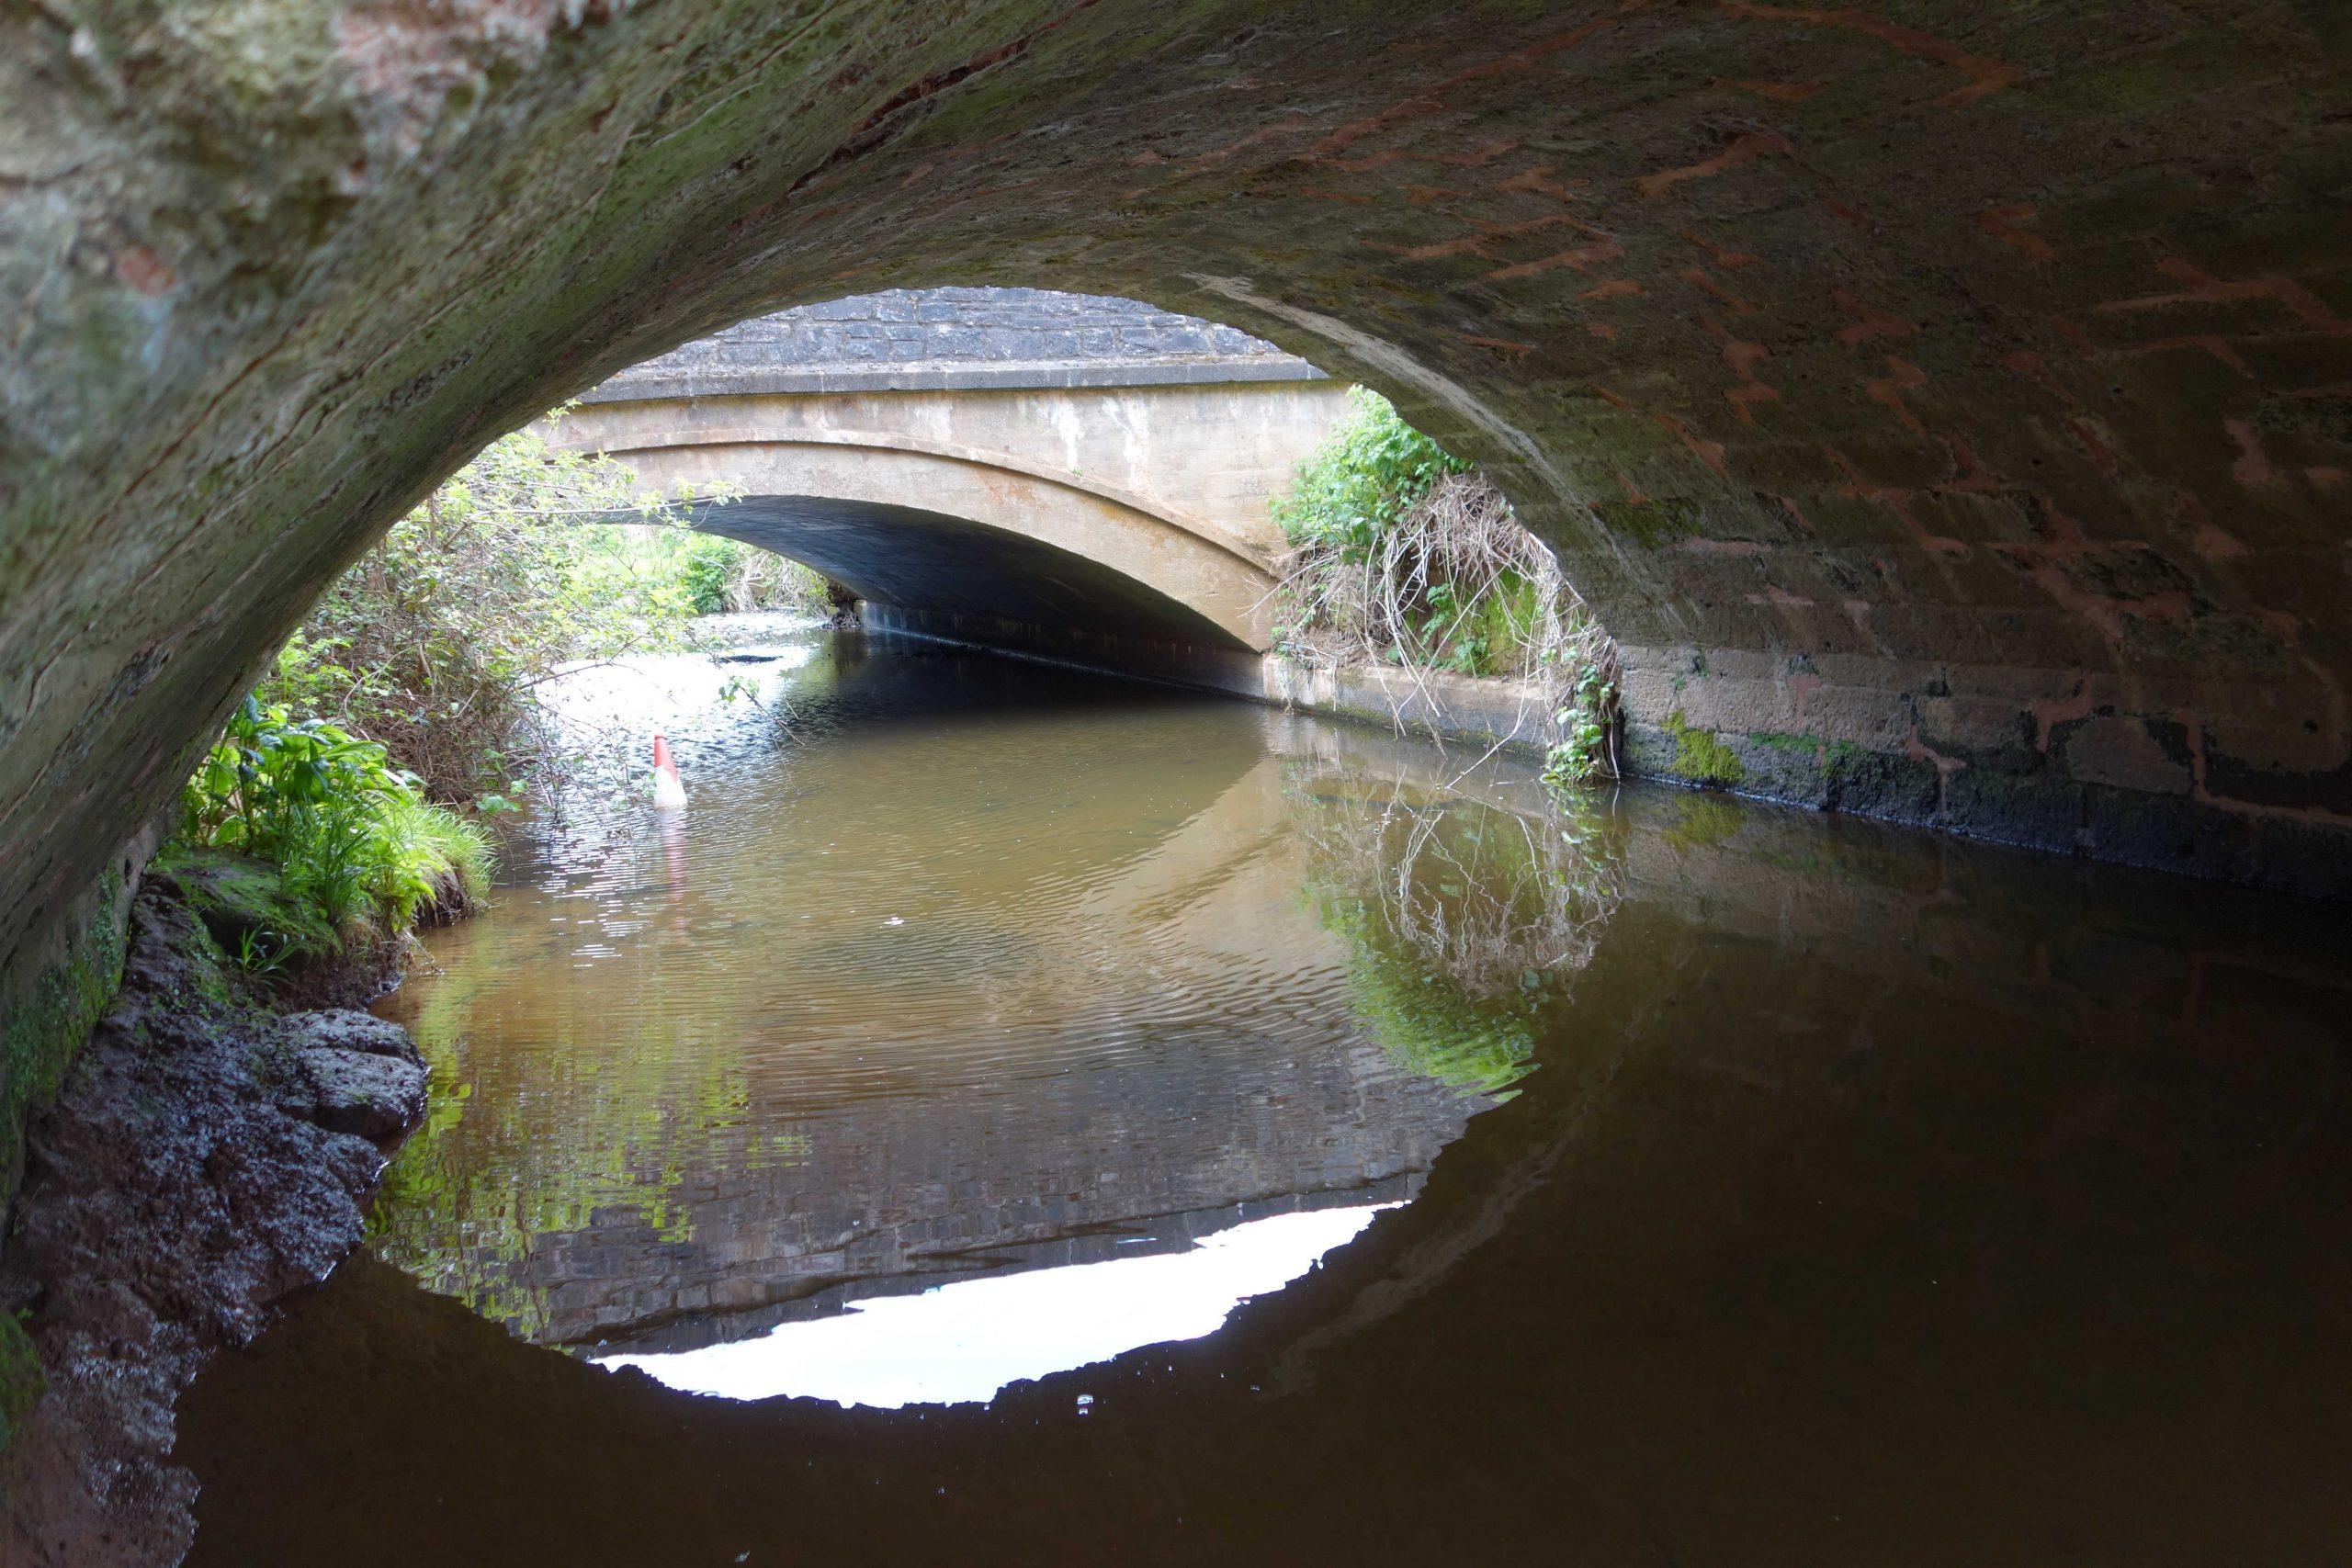 Rockbeare bridges